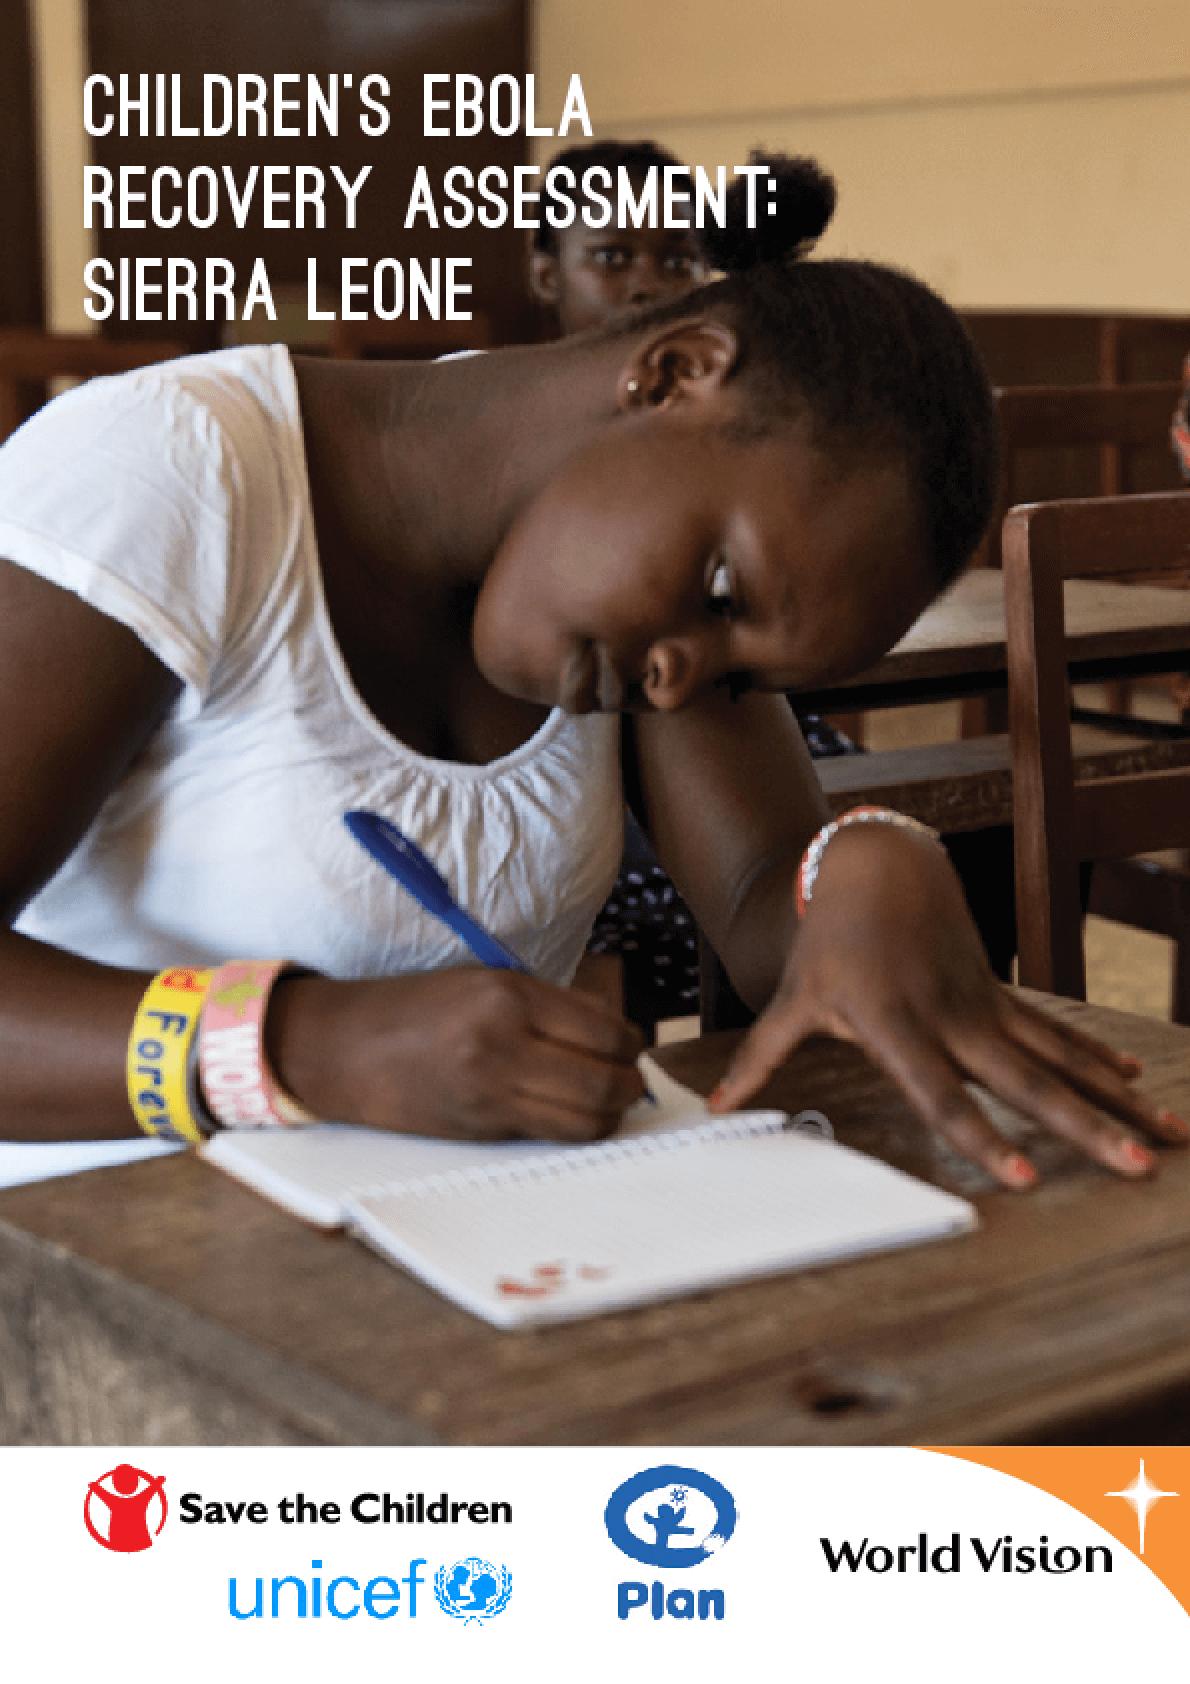 Children's Ebola Recovery Assessment: Sierra Leone